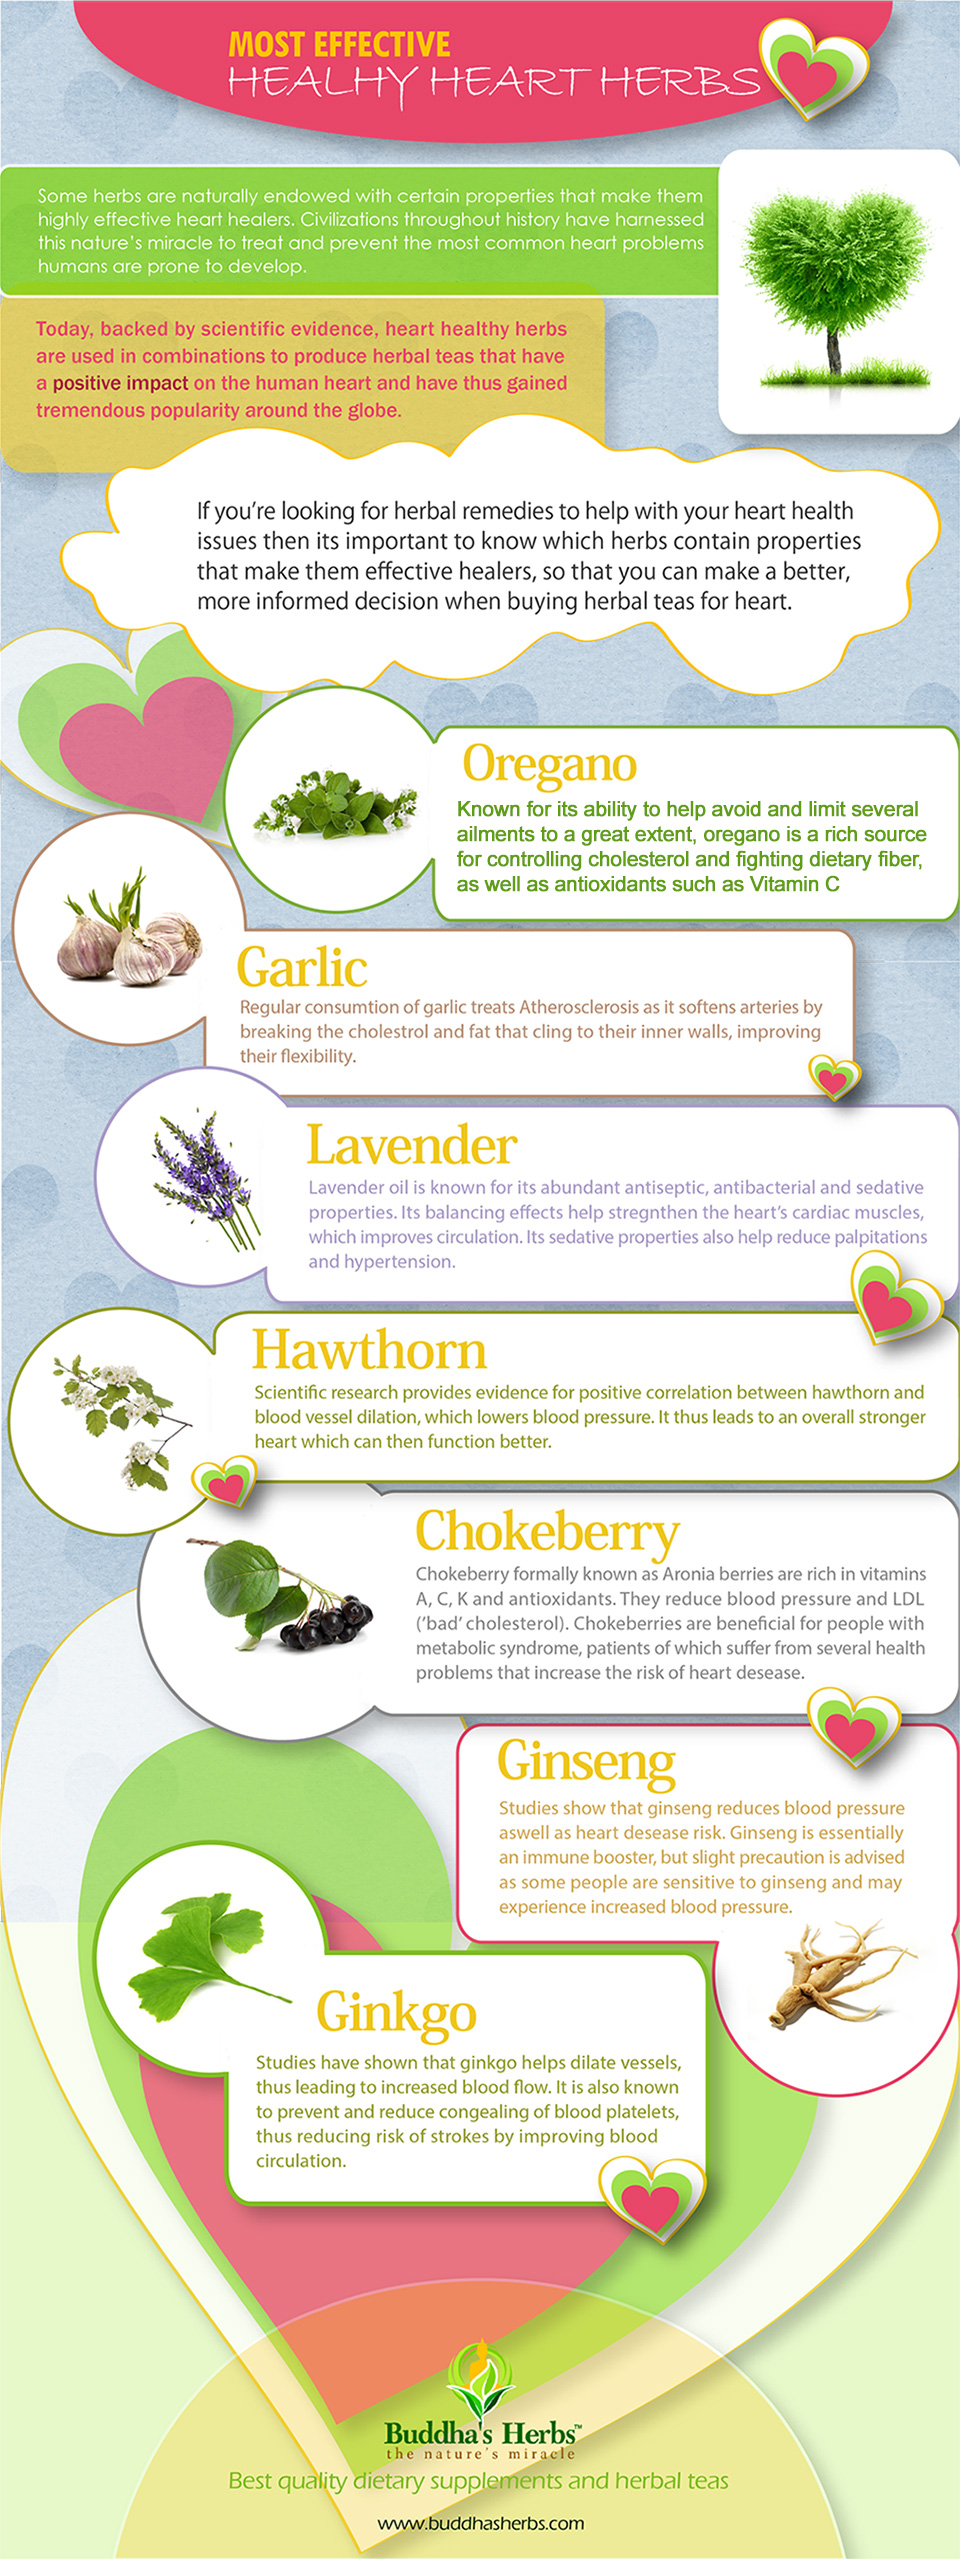 Herbs-heart-health-infographic